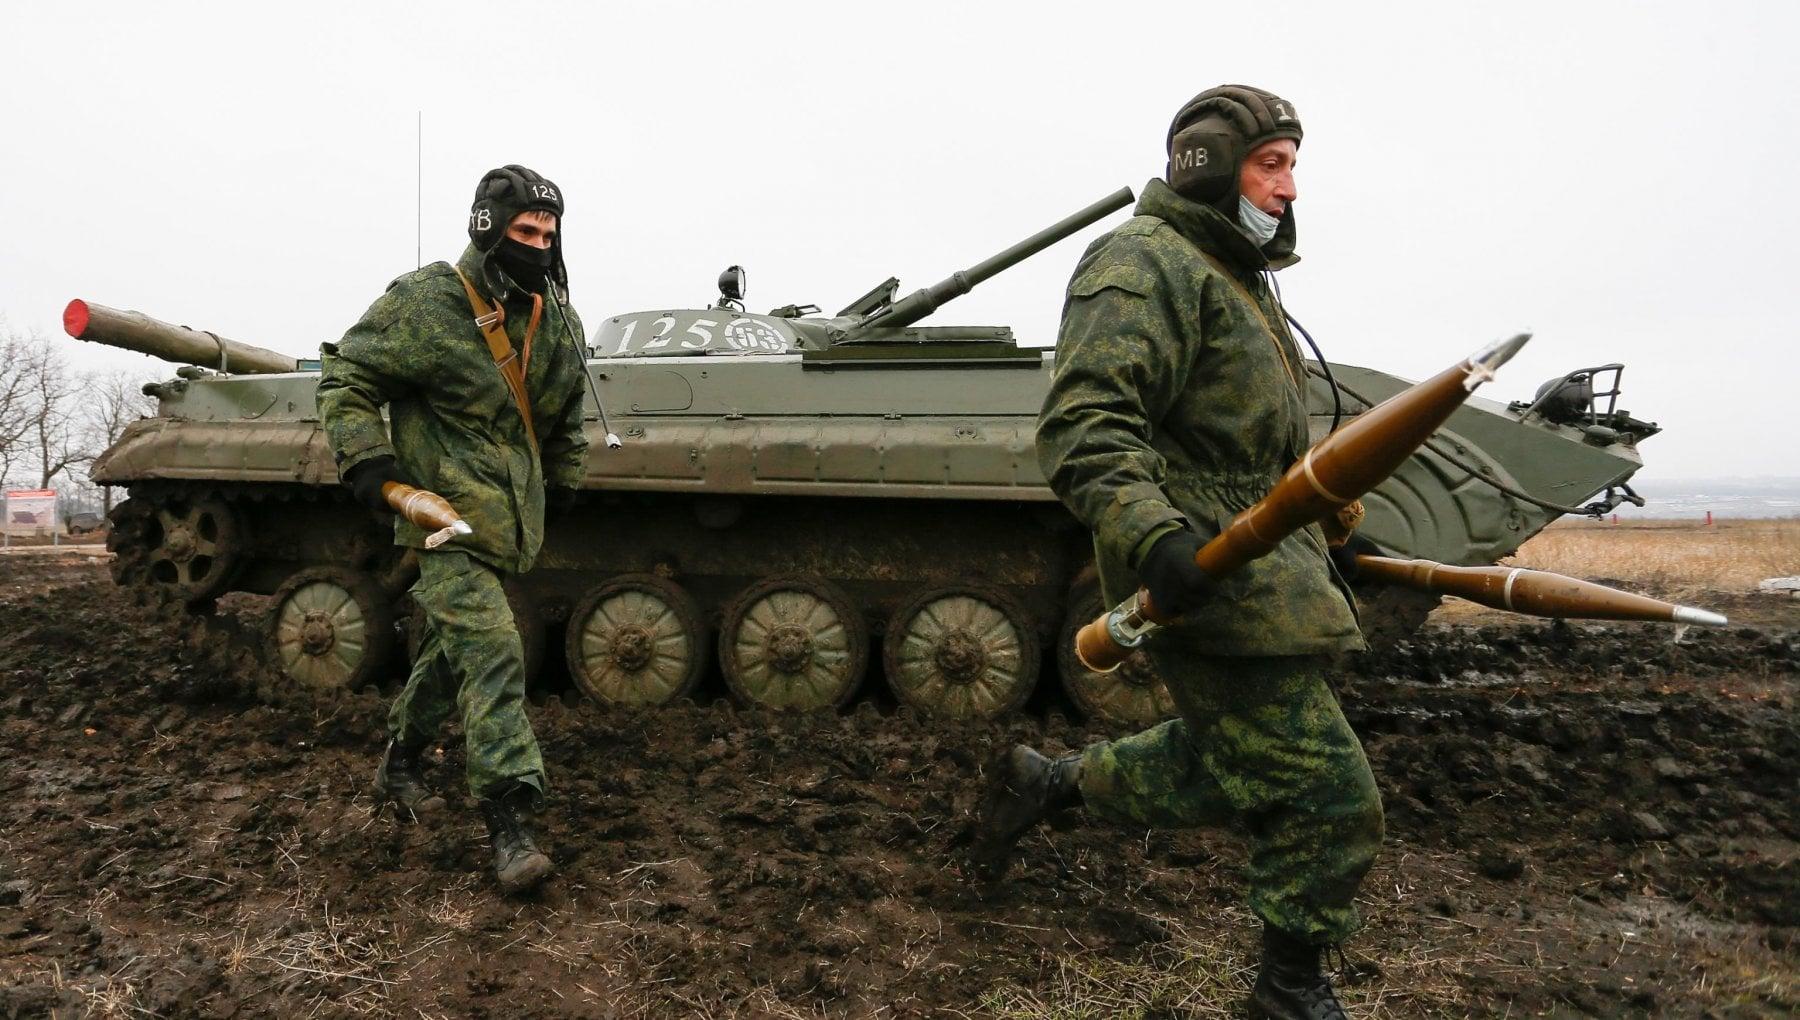 212112708 acaedab2 093a 46c6 a77d c5d56d655142 - Russia, Putin smobilita le truppe al confine con l'Ucraina e invita Zelenskij a Mosca